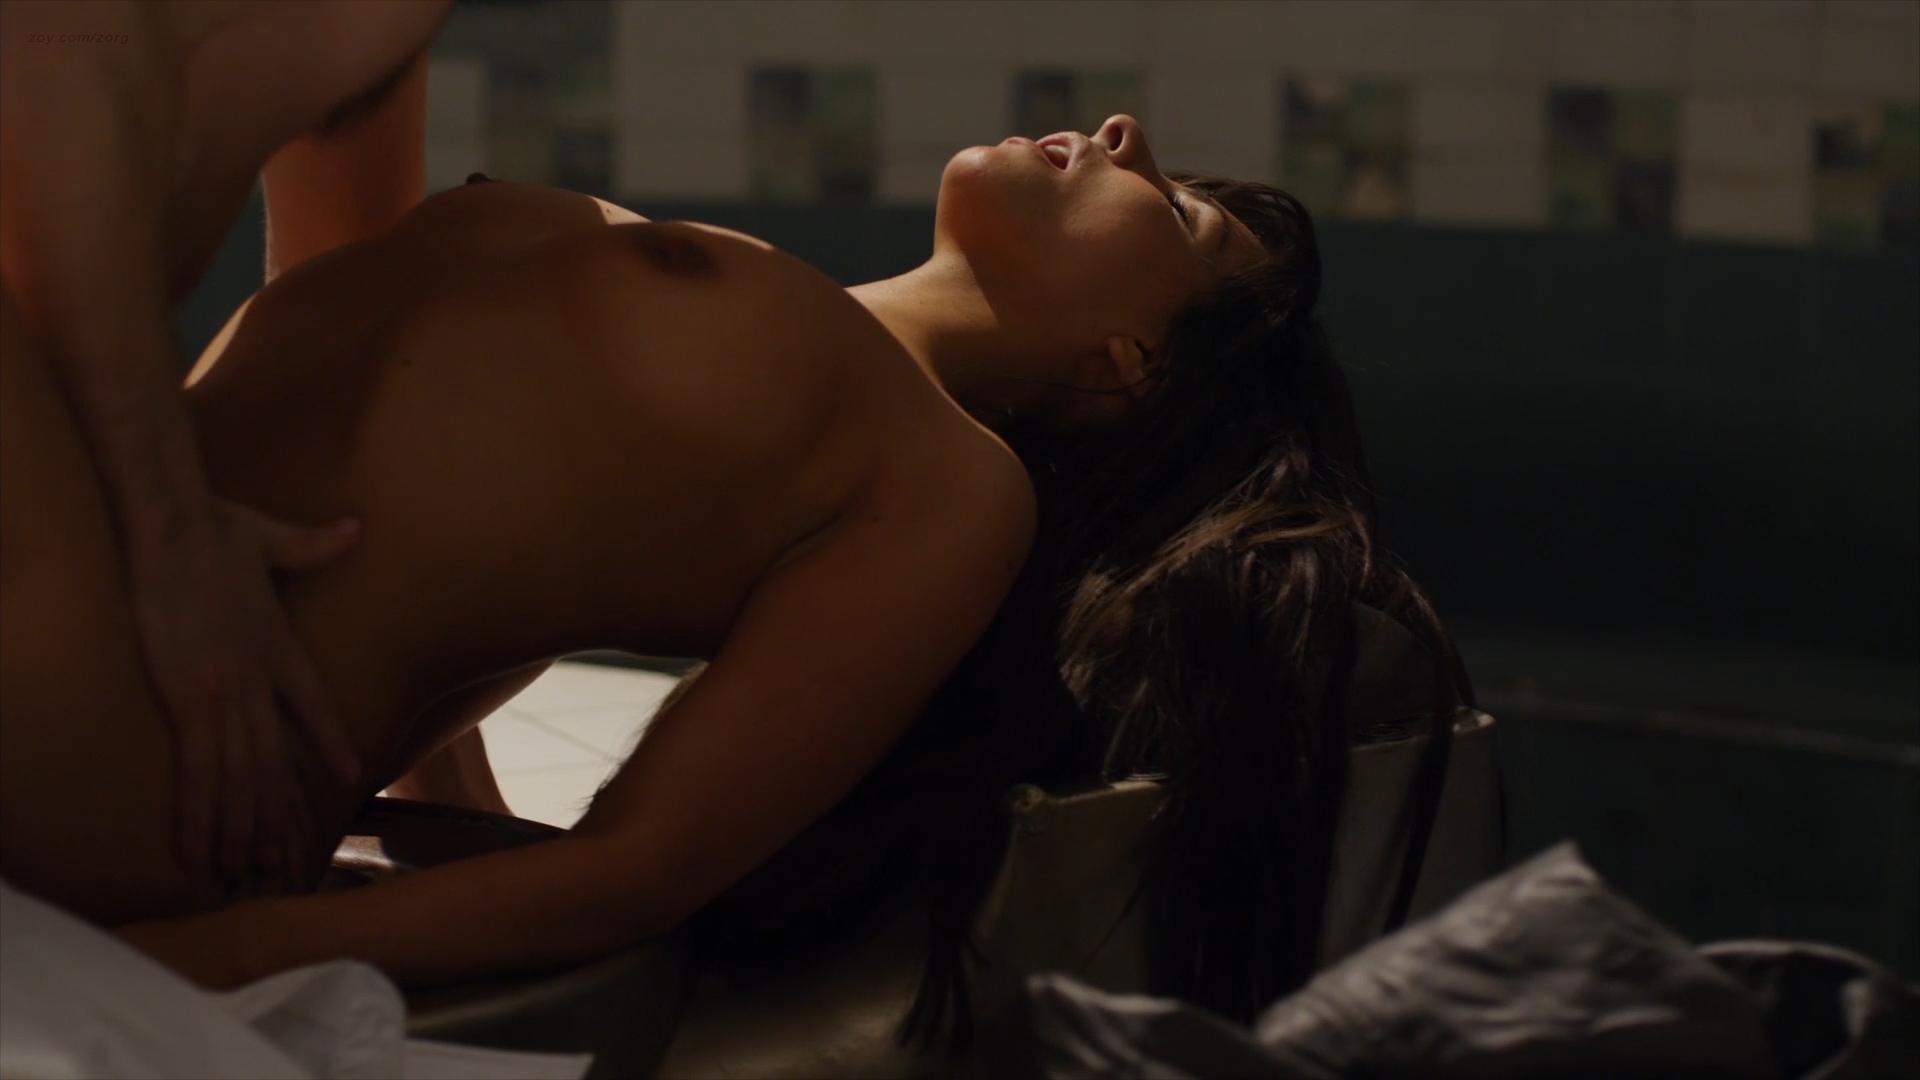 Sadie Katz nude Roxanne Pallett nude sex and others nude - Wrong Turn 6 Last_Resort (2014) hd1080p (16)